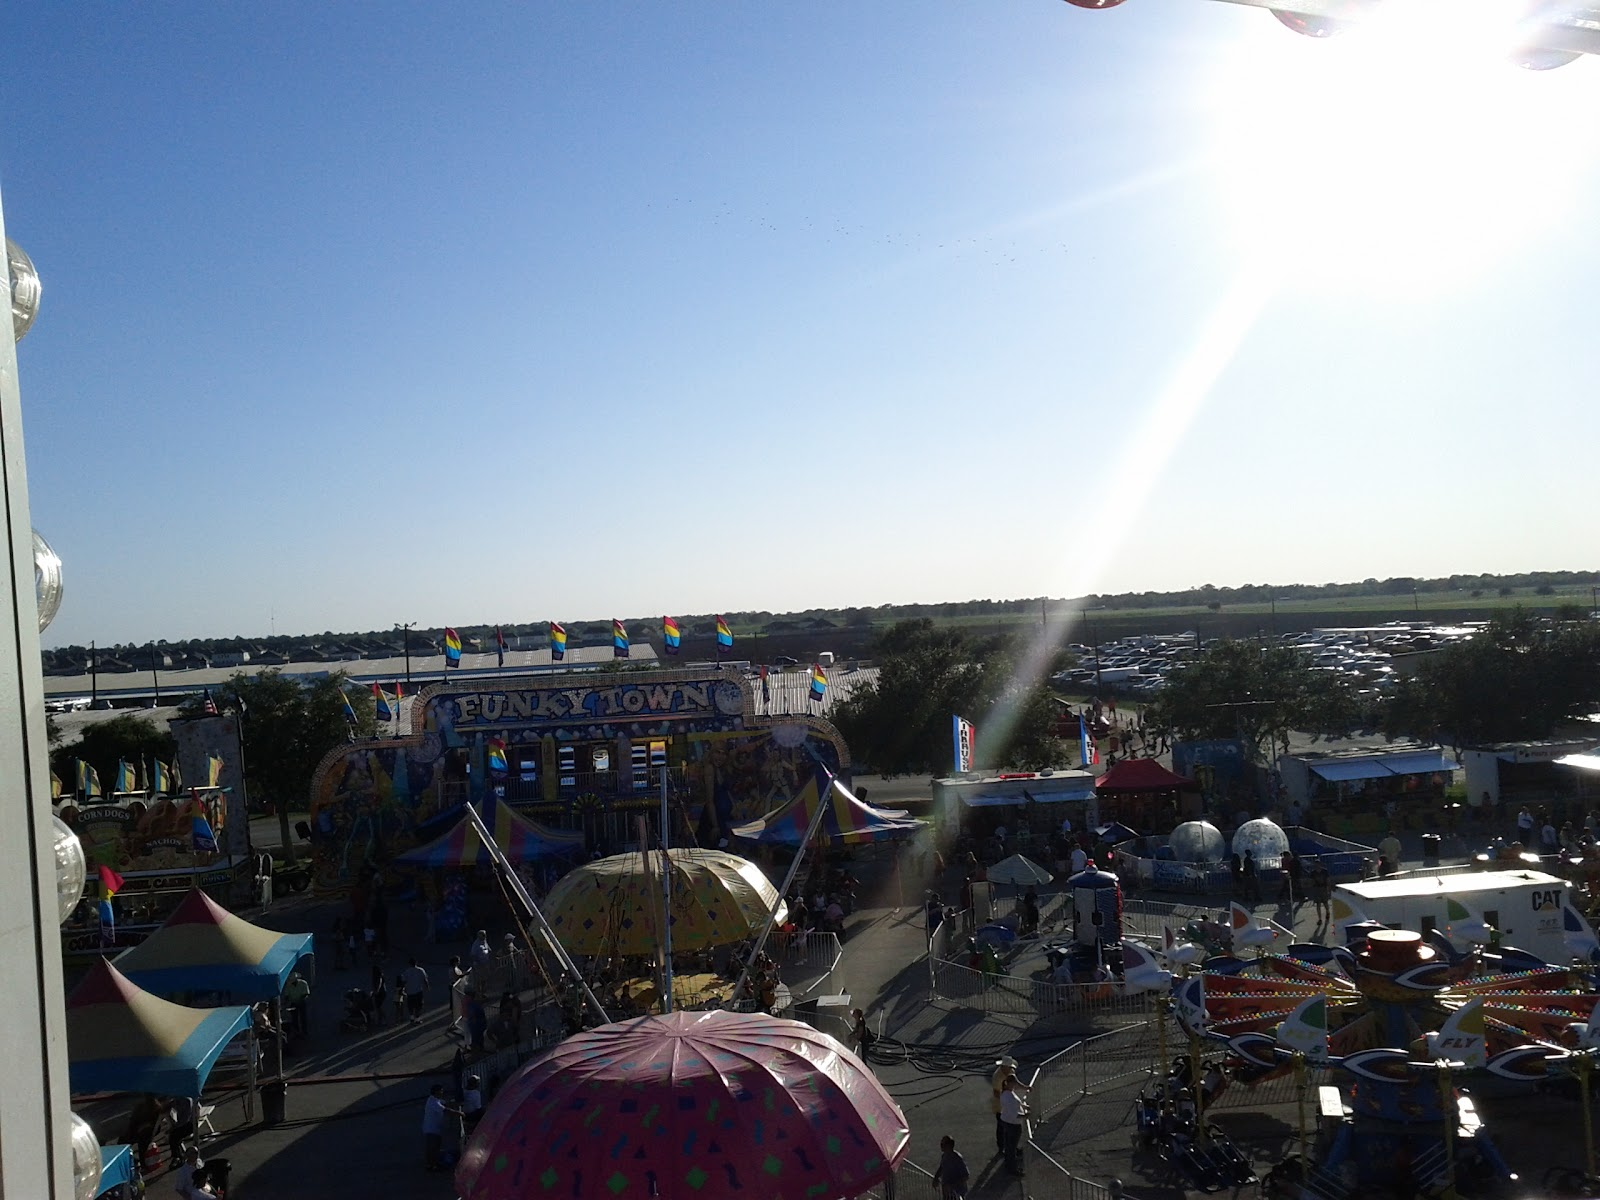 Fort Bend County Fair 2011 - IMG_20111001_174630.jpg